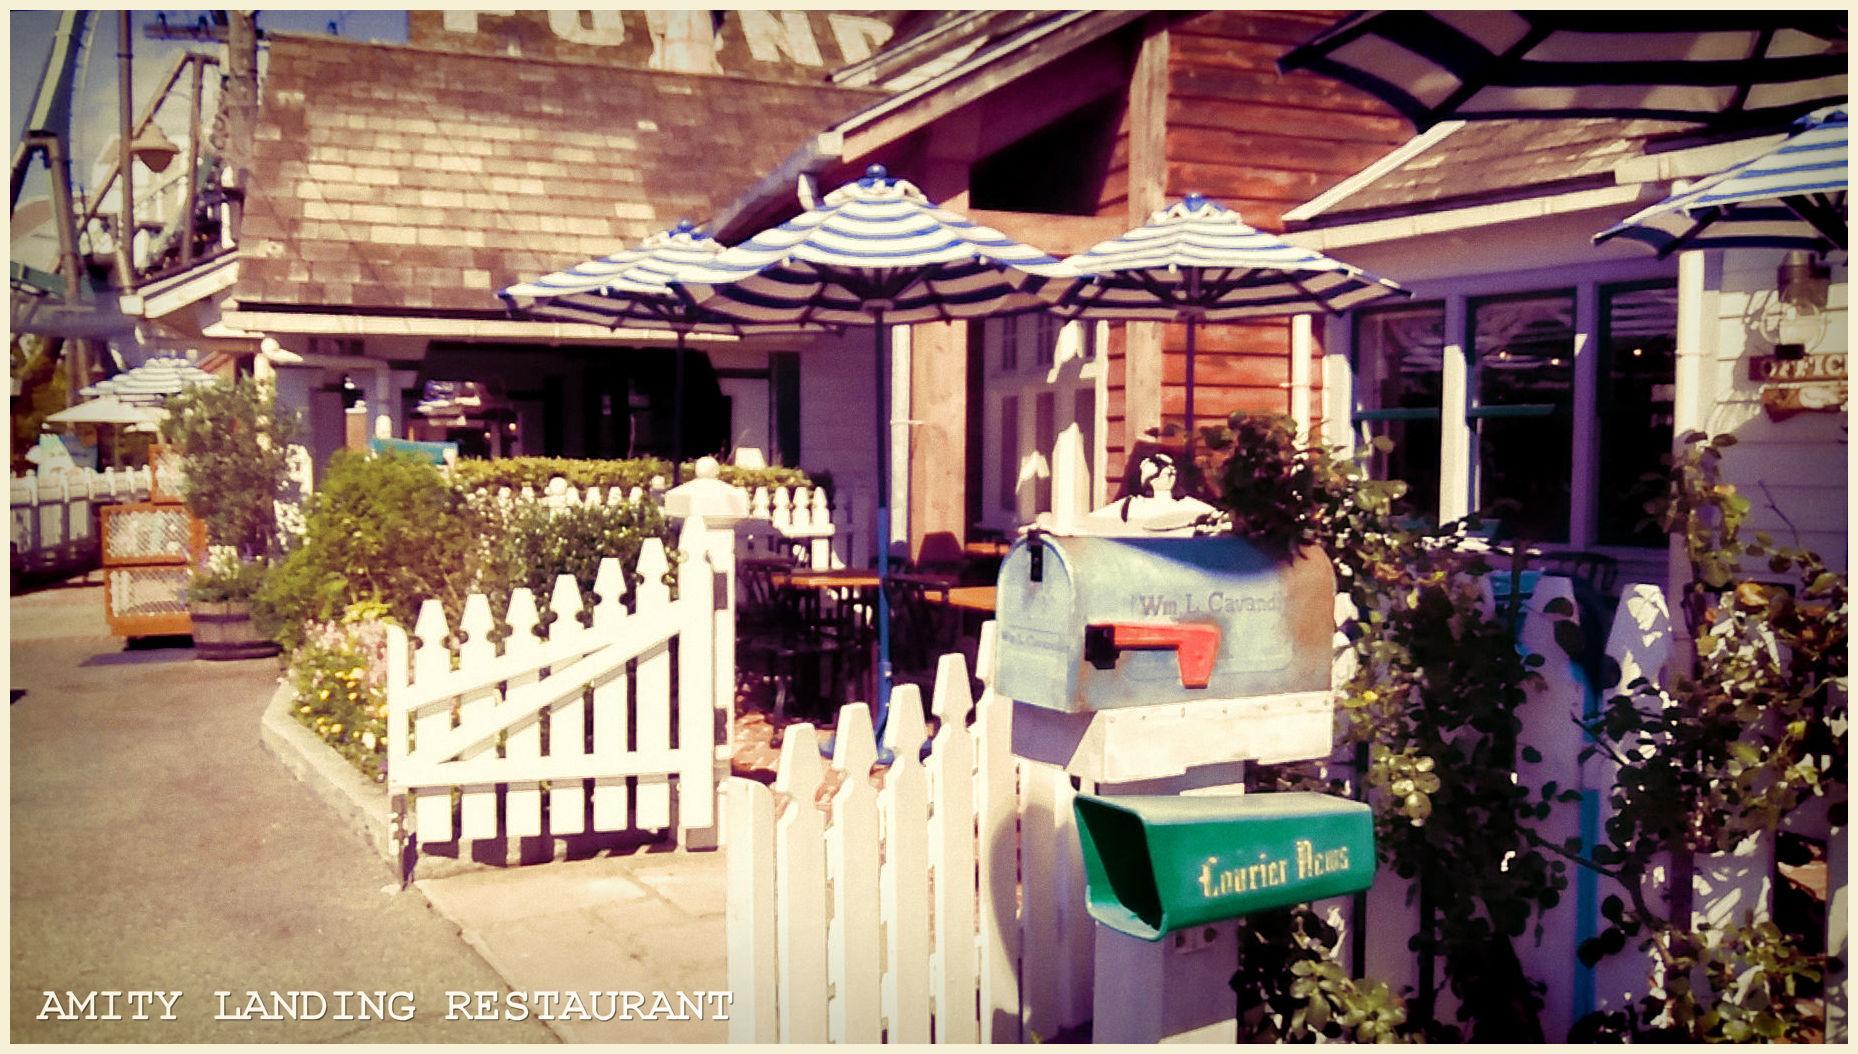 Amity Landing Restaurant_2_ps